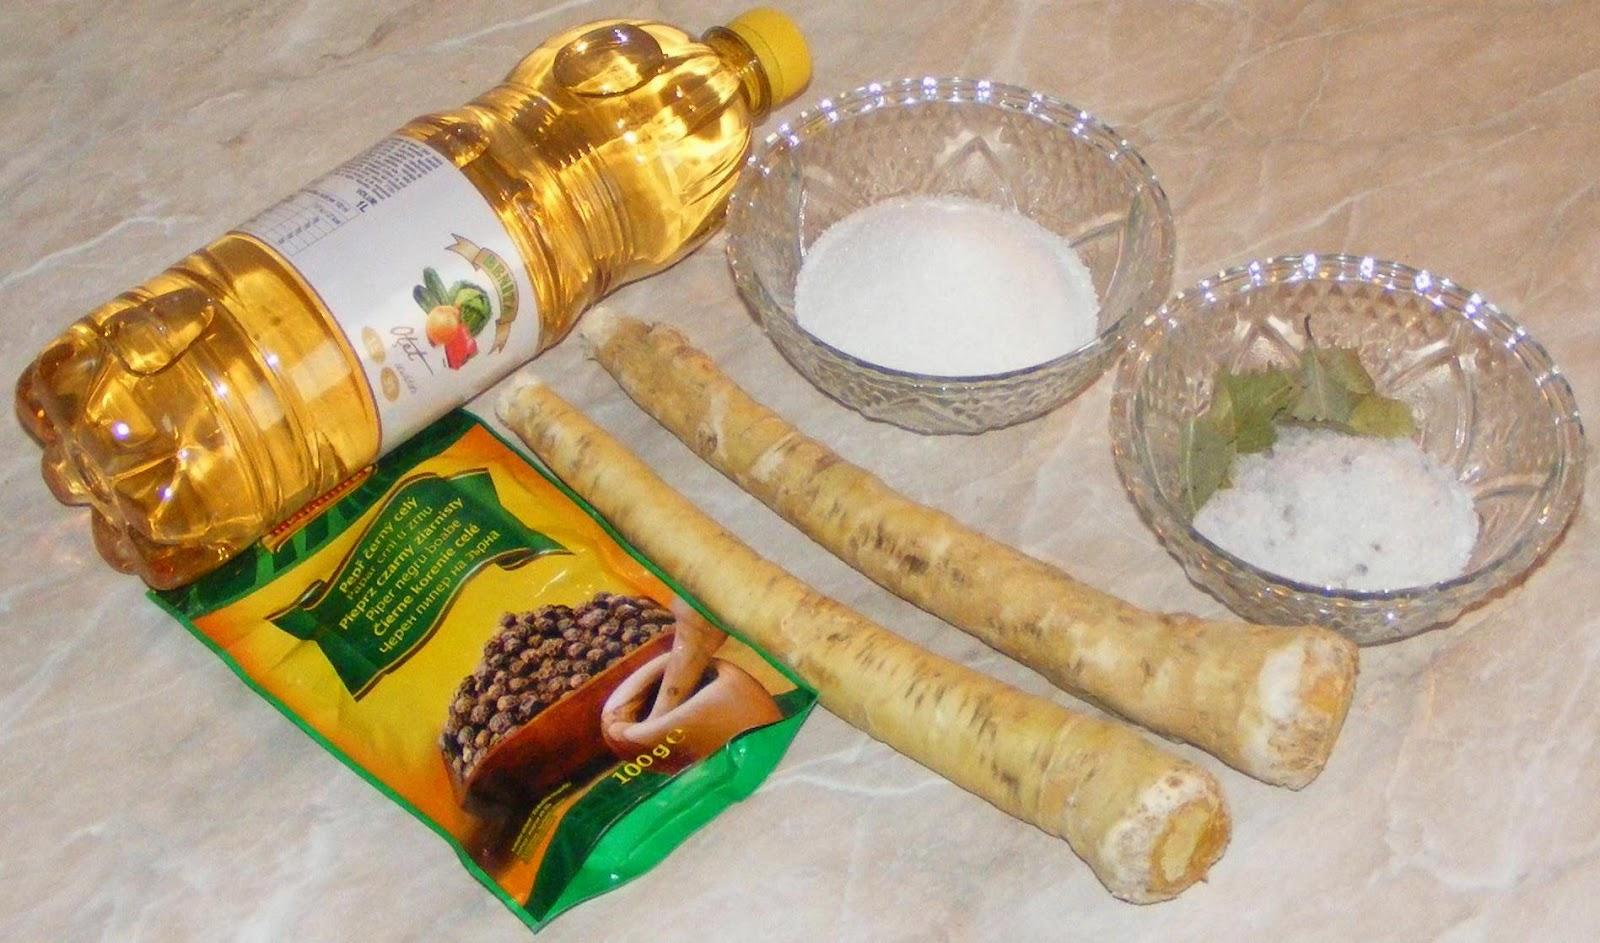 ingrediente pentru gogosari in otet pentru iarna, ingrediente pentru gogosari murati pentru iarna, cum se pun gogosarii in otet, cum punem gogosari in otet pentru iarna, reteta gogosari in otet,